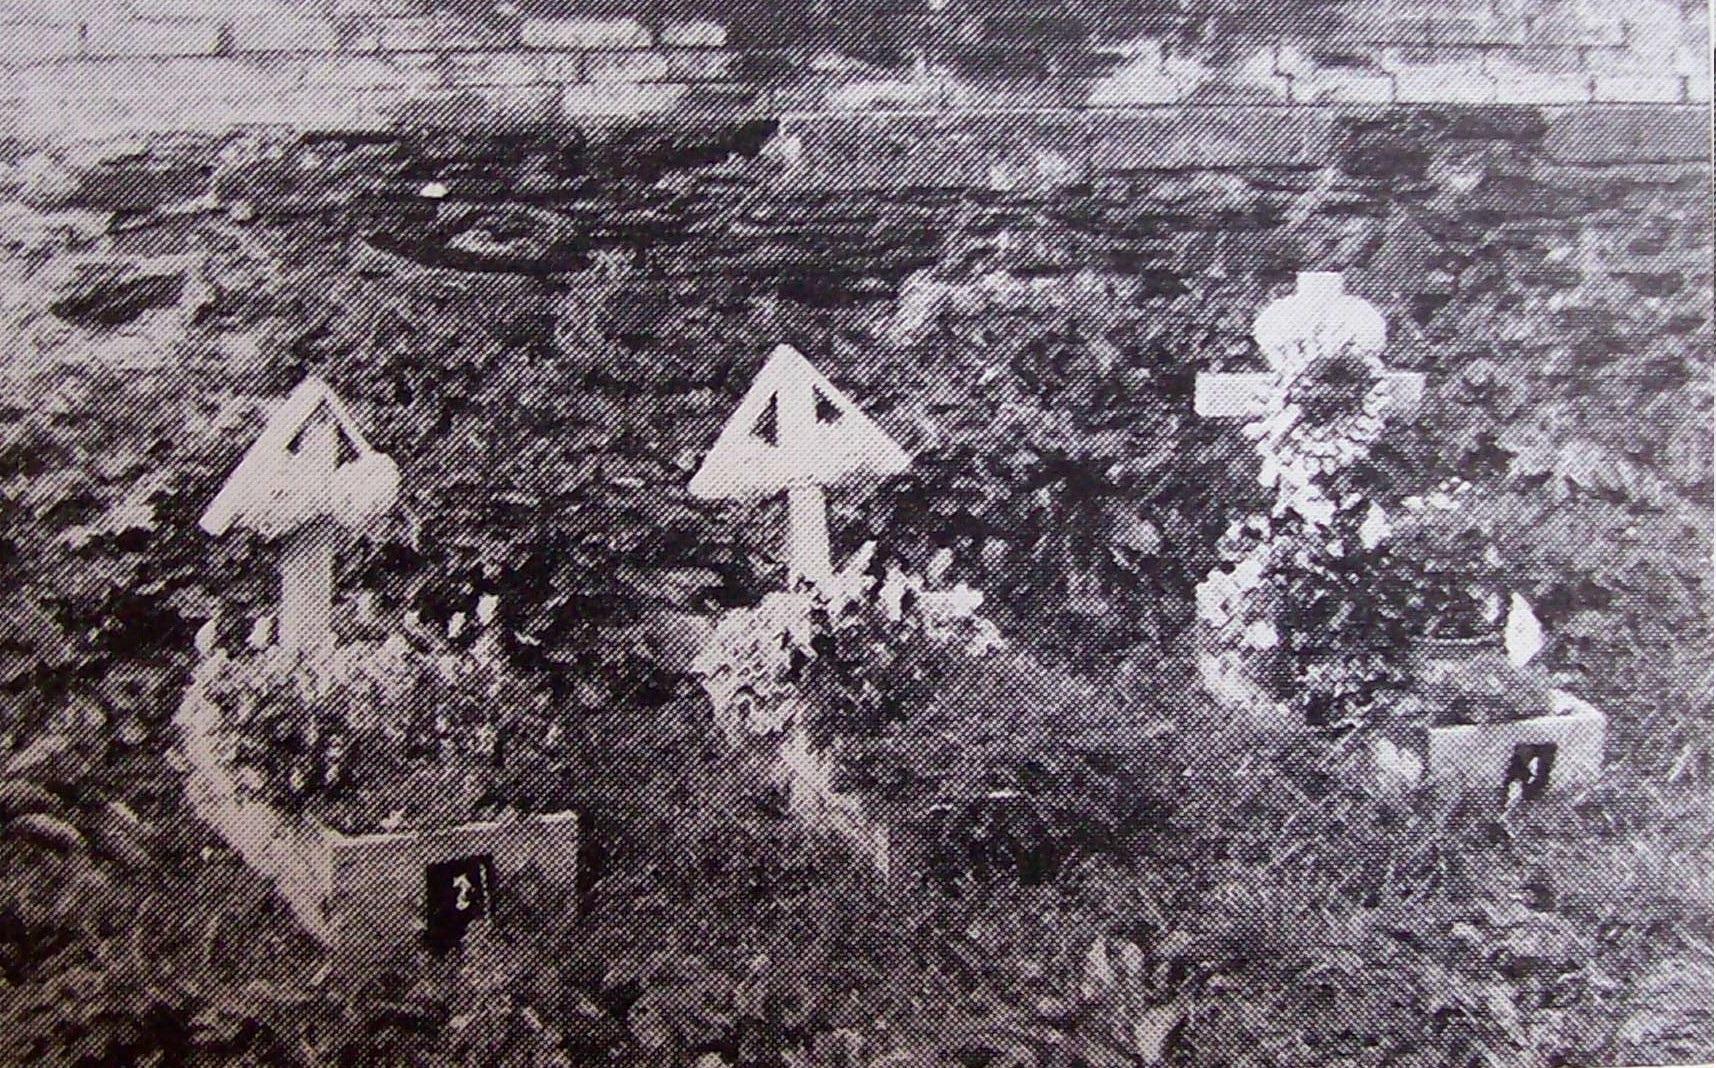 Dětské hroby reemigrantů z Rumunska, Ostrov-Malšín